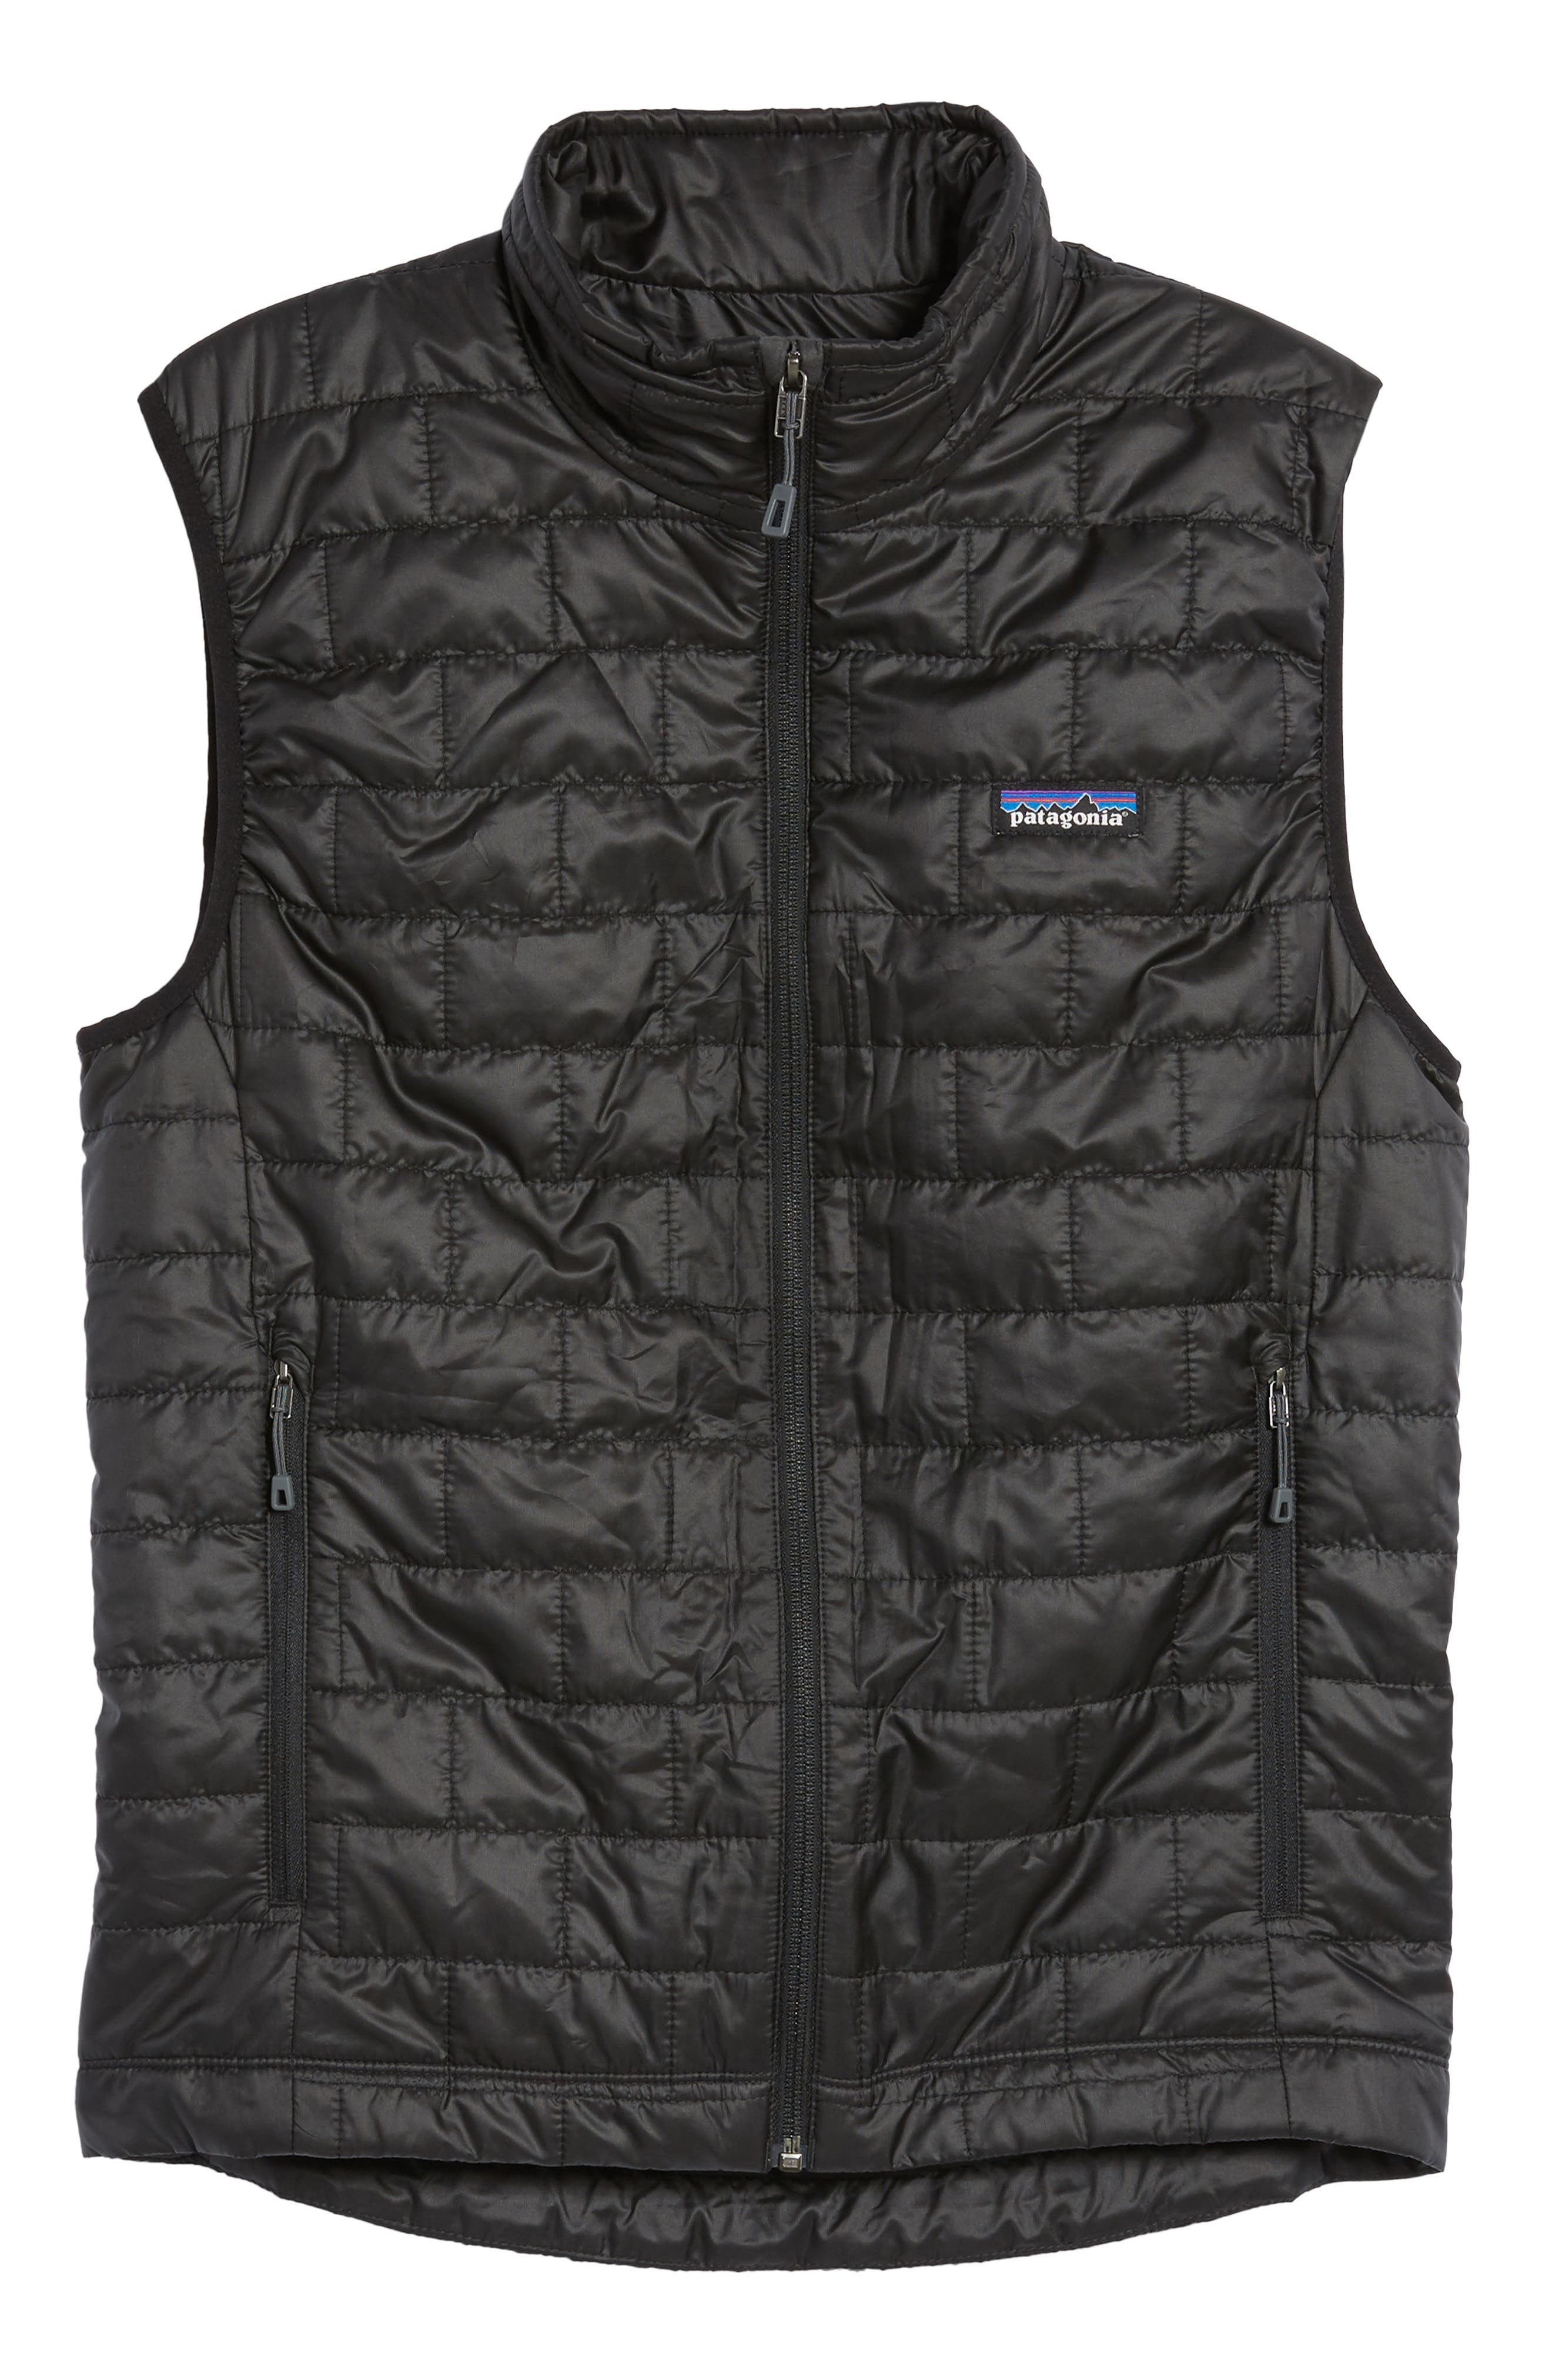 PATAGONIA Nano Puff<sup>®</sup> Vest, Main, color, BLACK